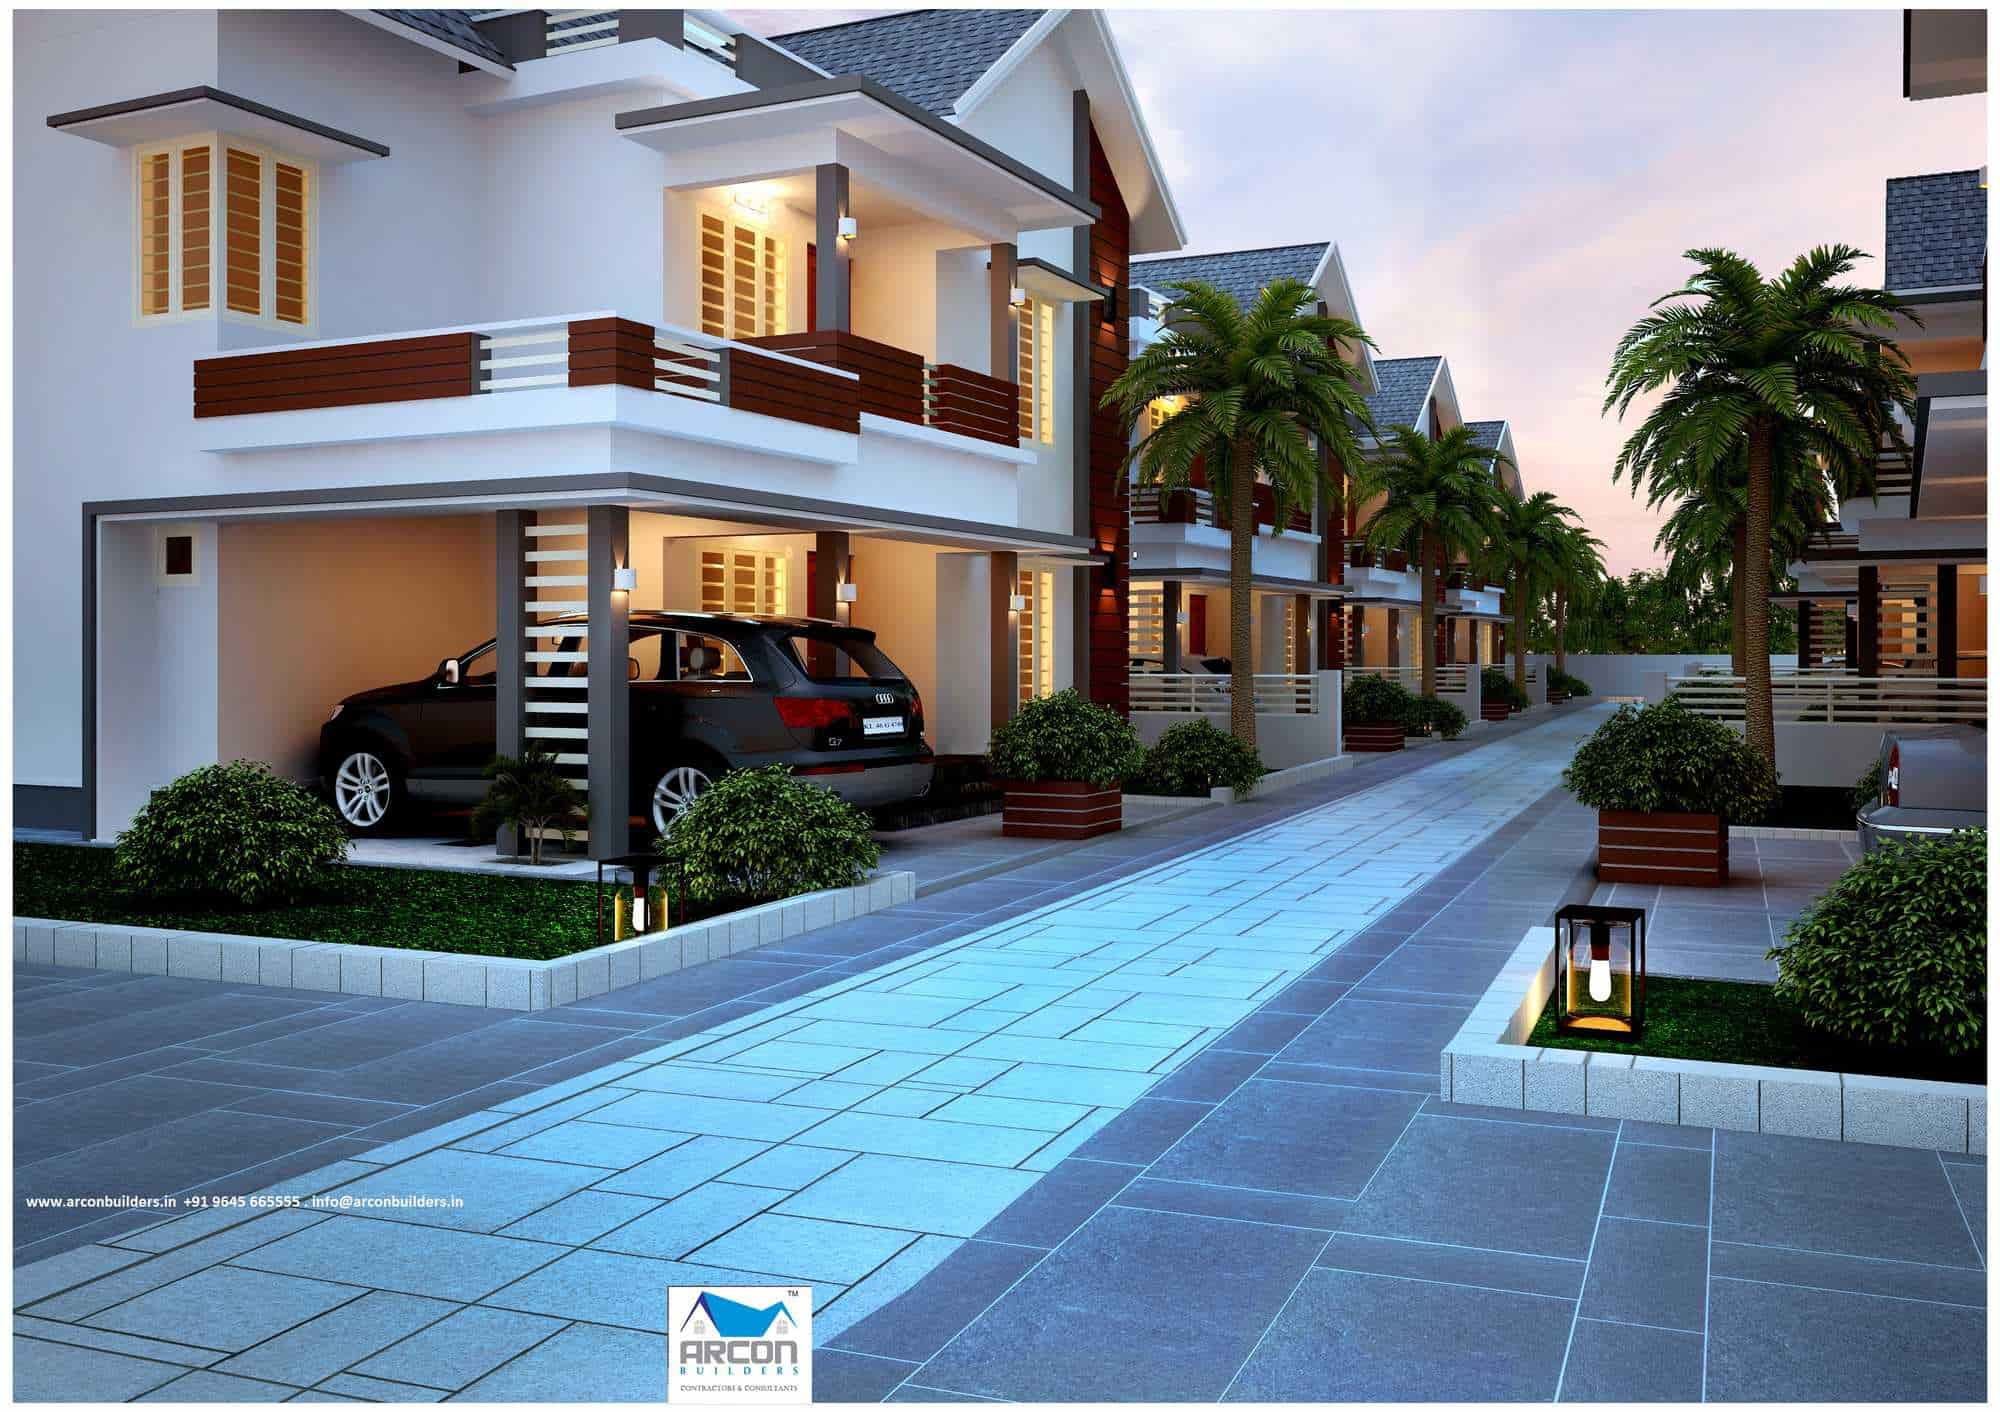 Arcon Builders, Kochi - Civil Contractors in Ernakulam - Justdial